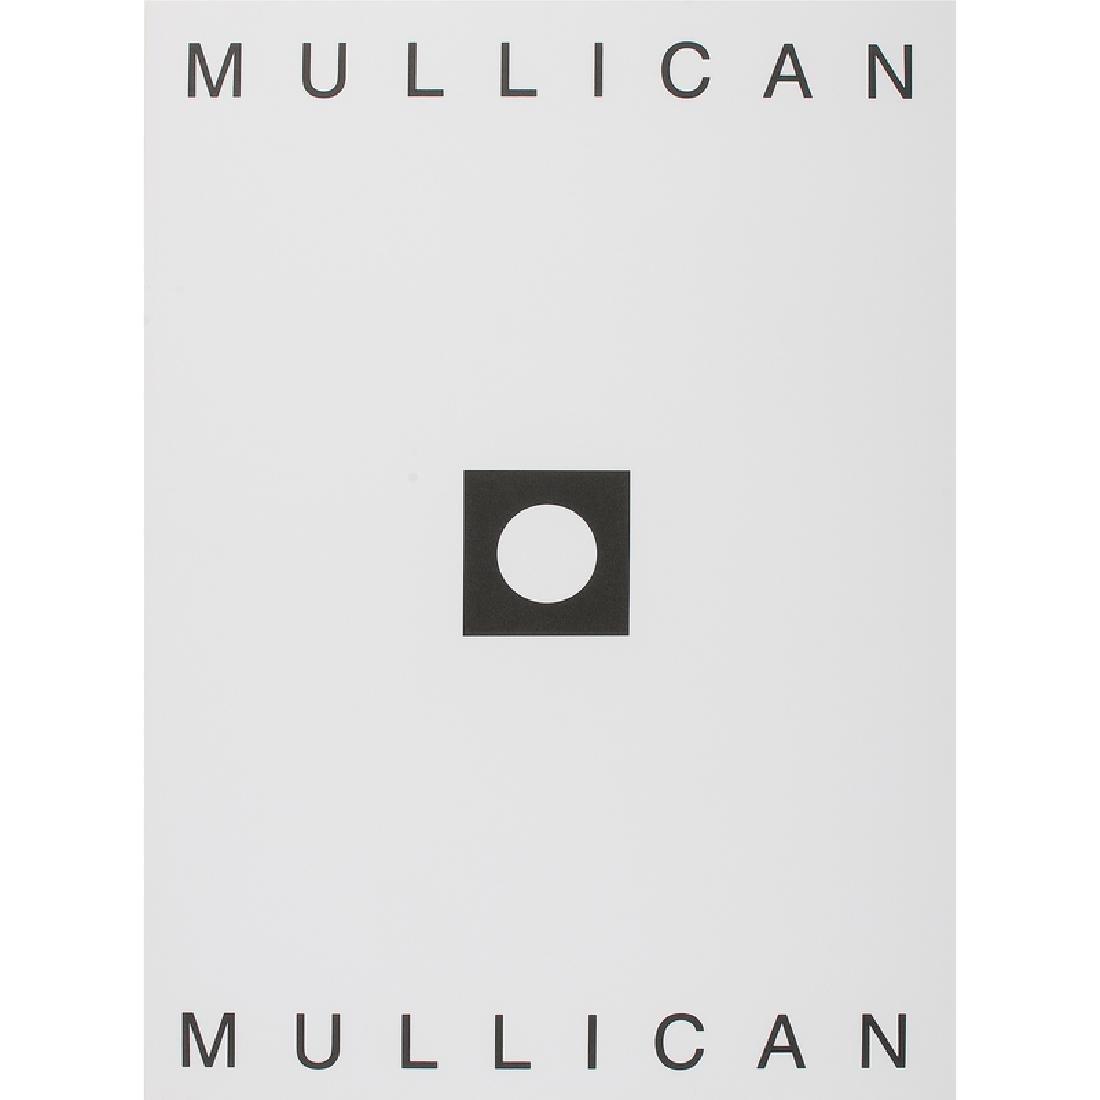 Matt Mullican (American, b. 1951)